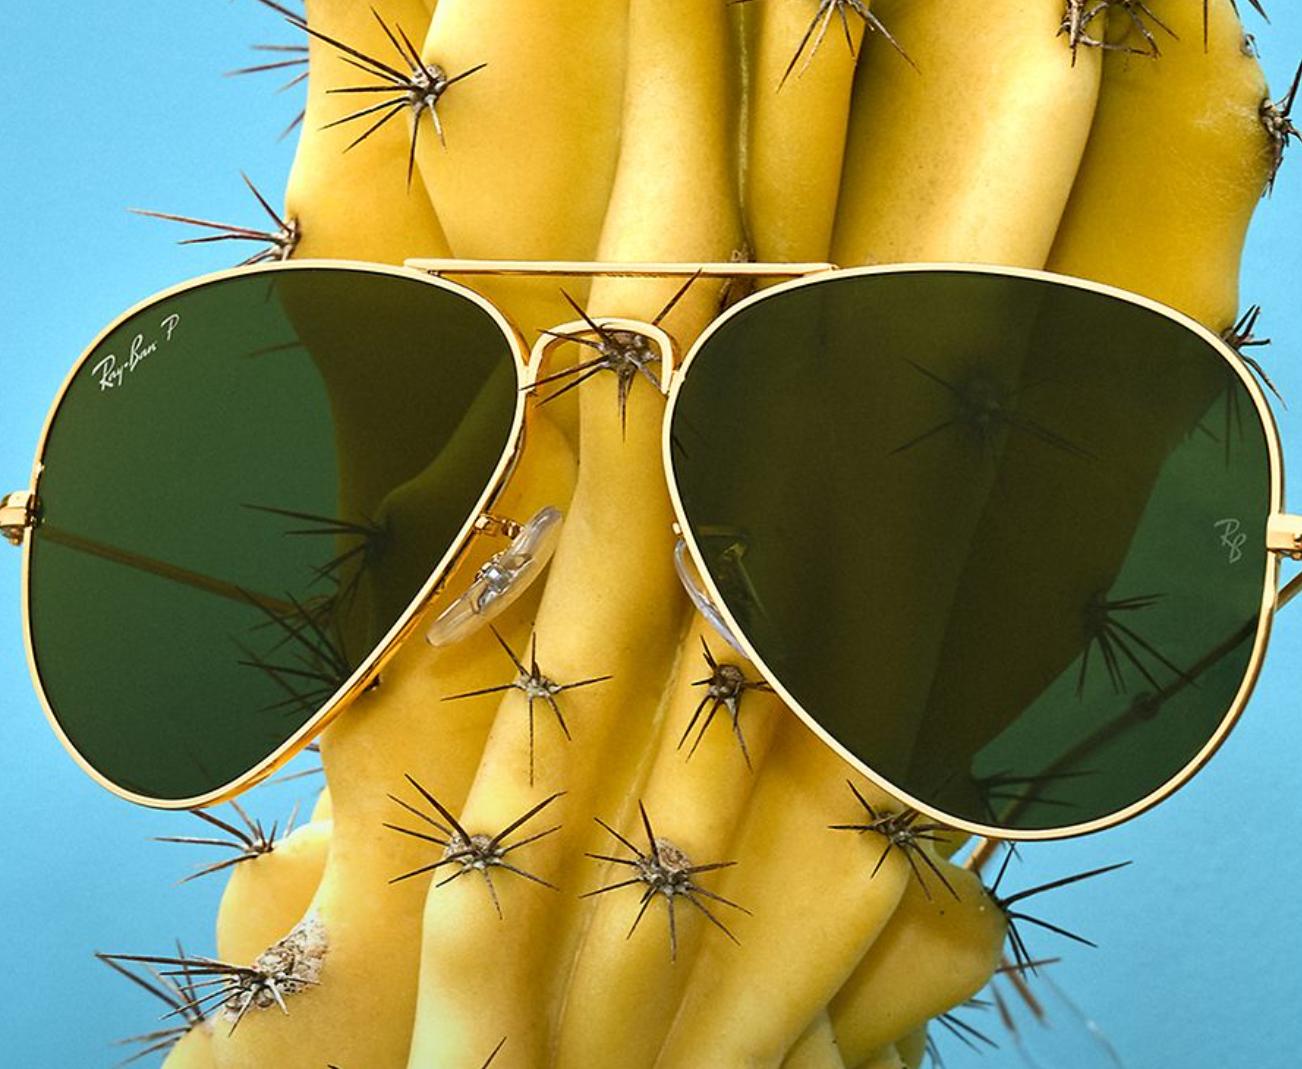 Ray-Ban: 25% off Sunglasses & Eyeglasses